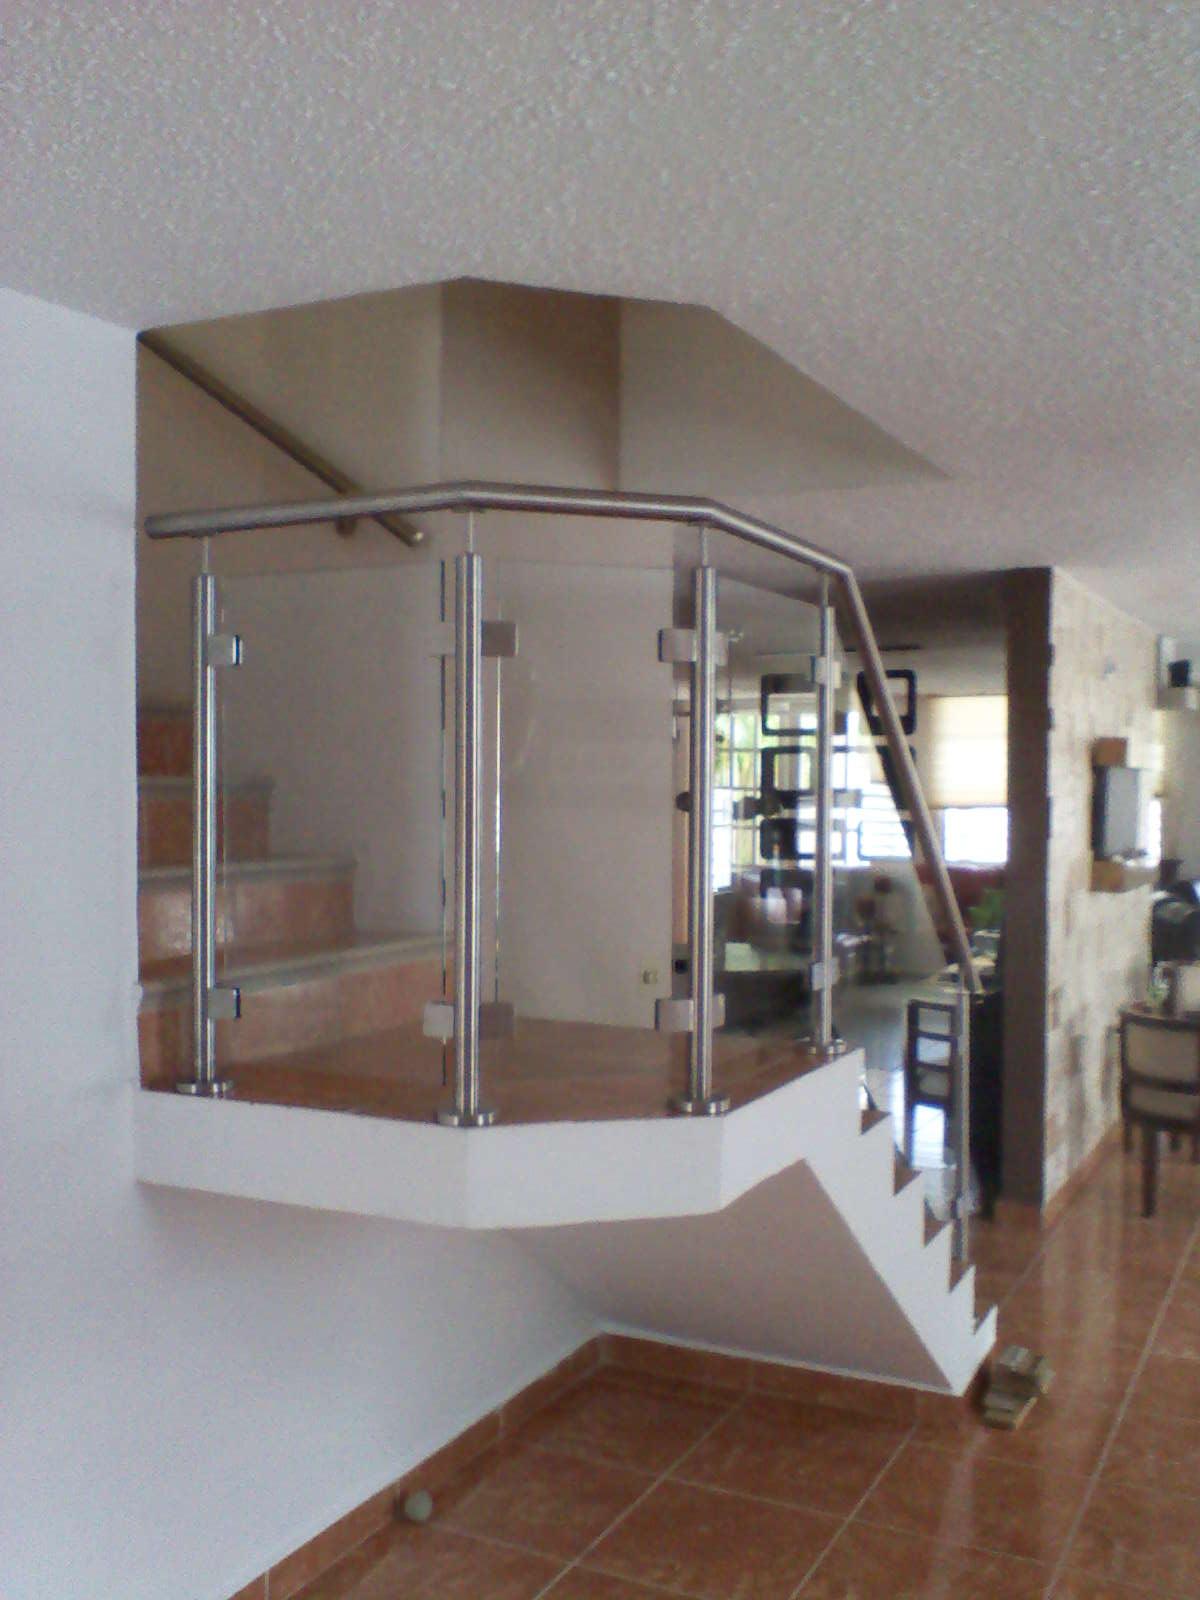 Accesorios De Baño En Puerto Rico: en stainless steel brackets en stainless steel para escalera cristal